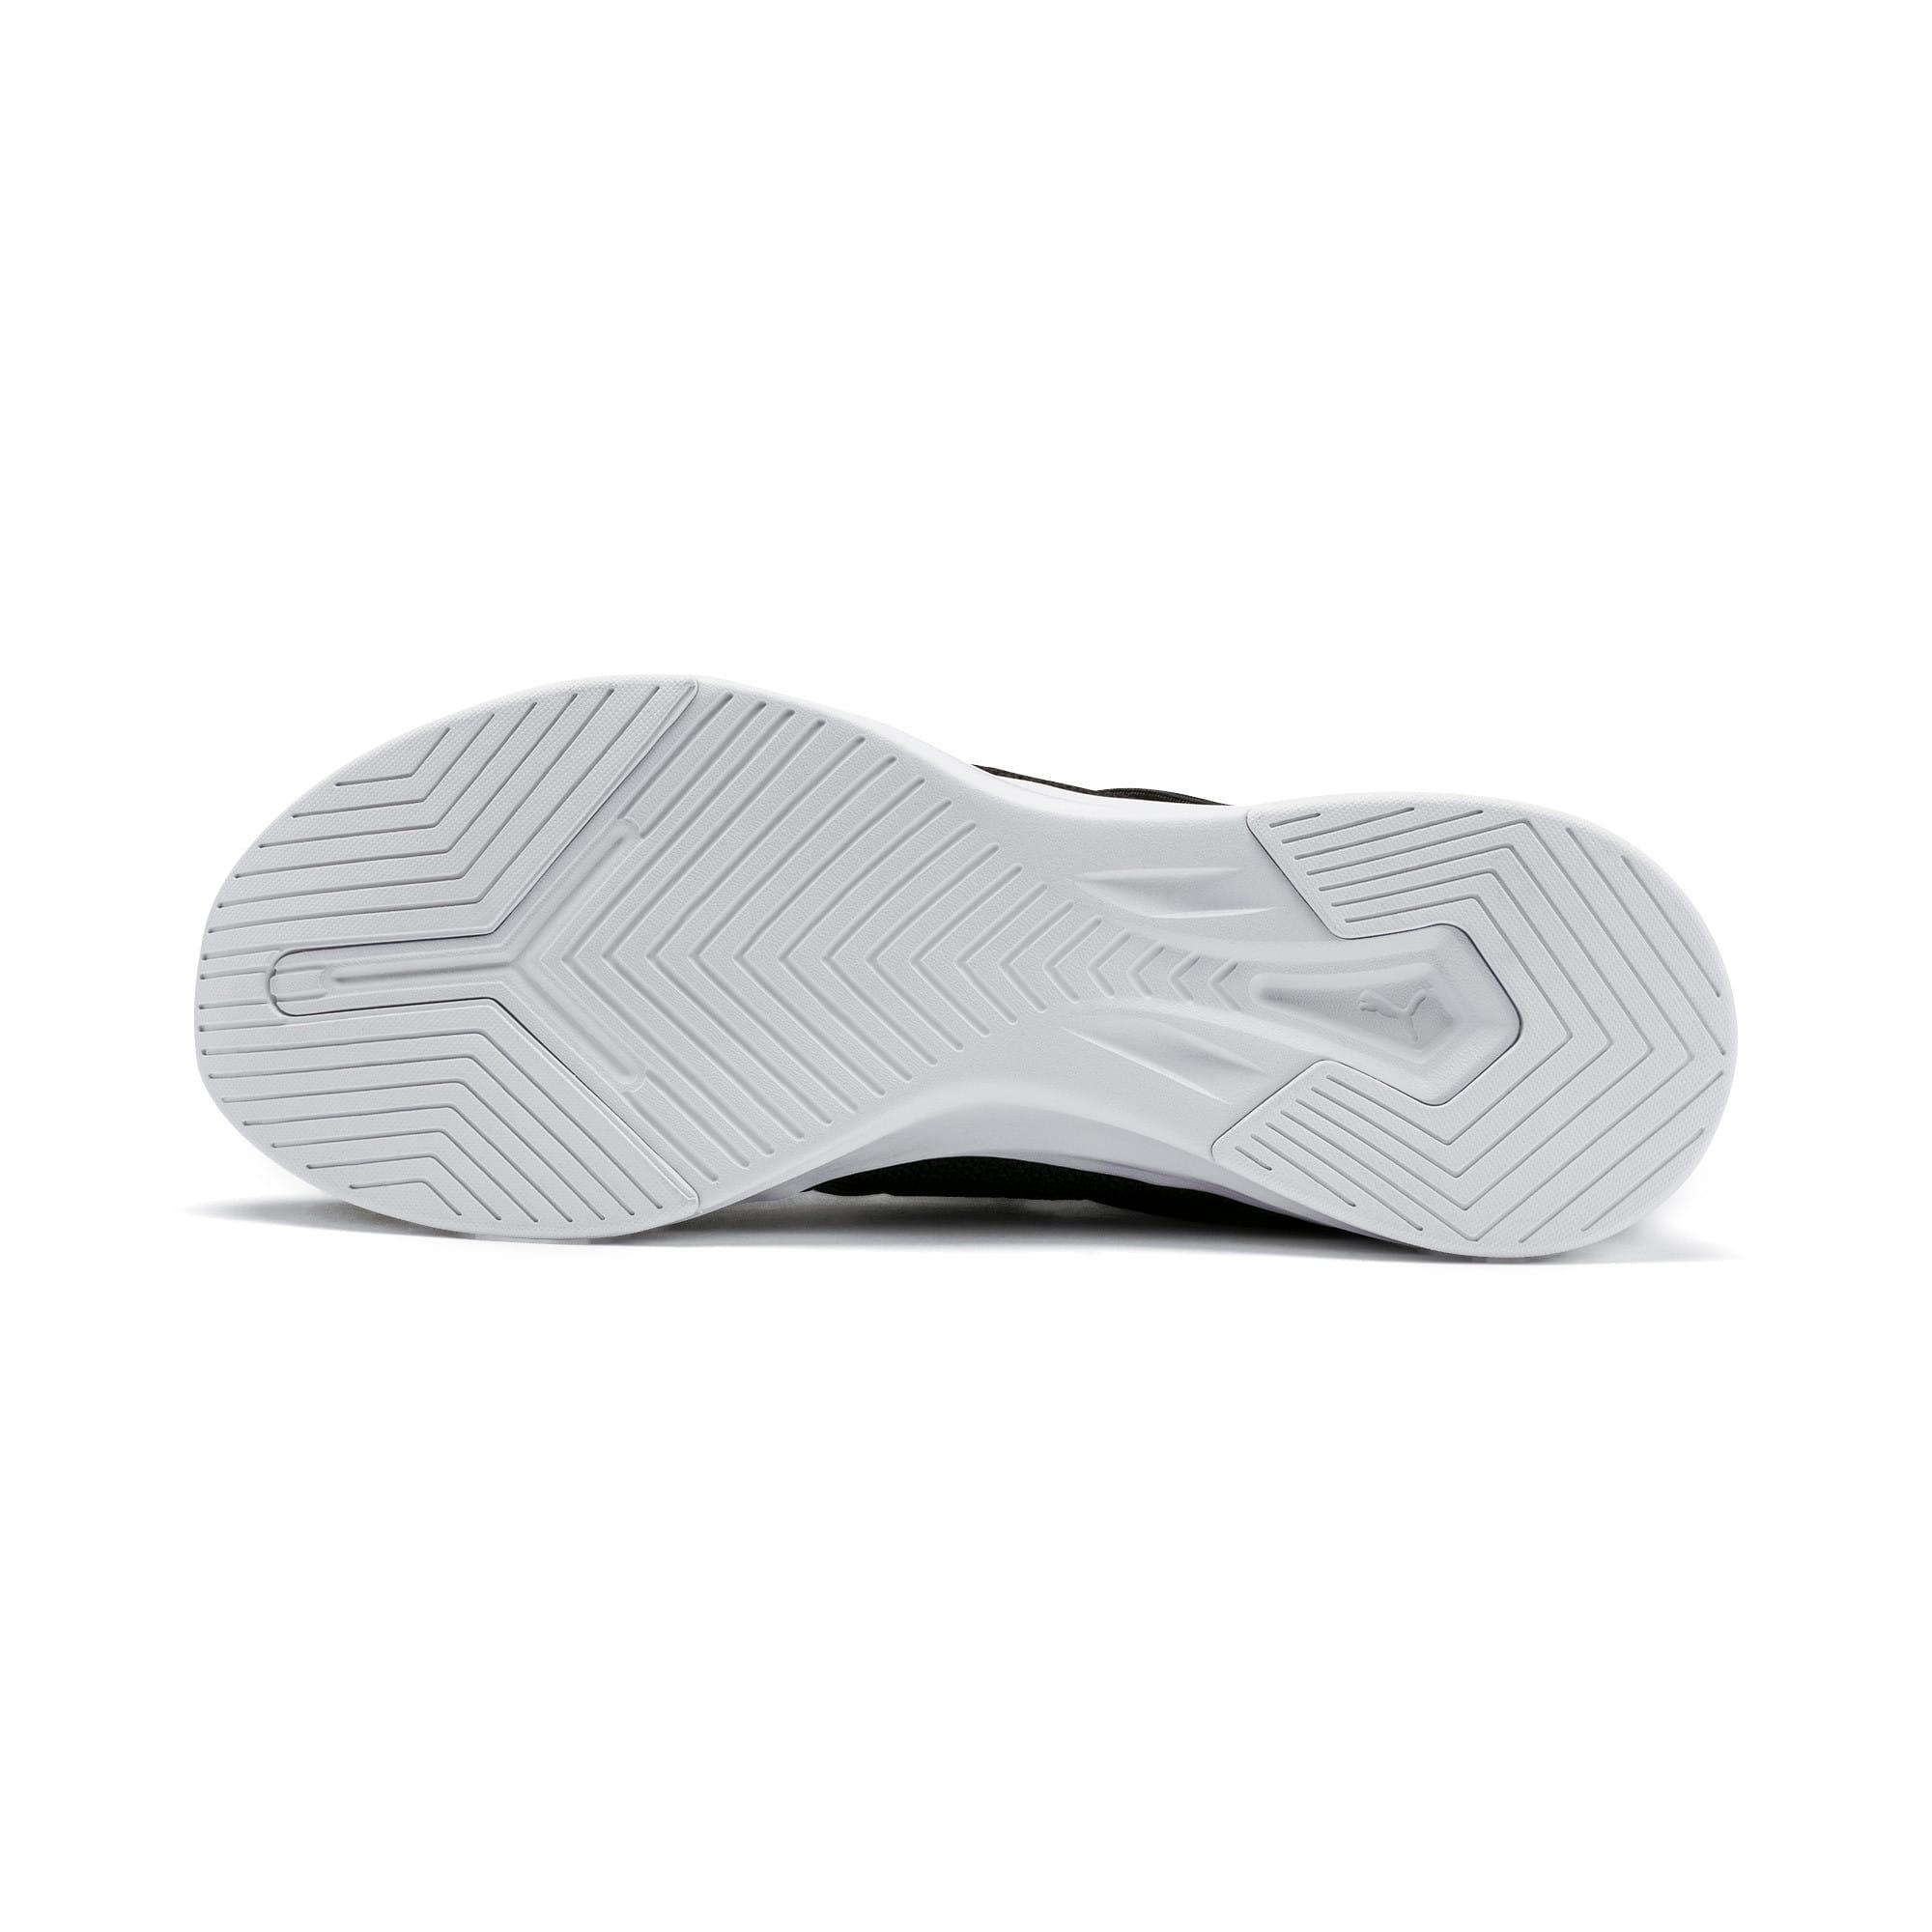 Thumbnail 5 of Persist XT Knit Men's Training Shoes, Puma Black-Puma White, medium